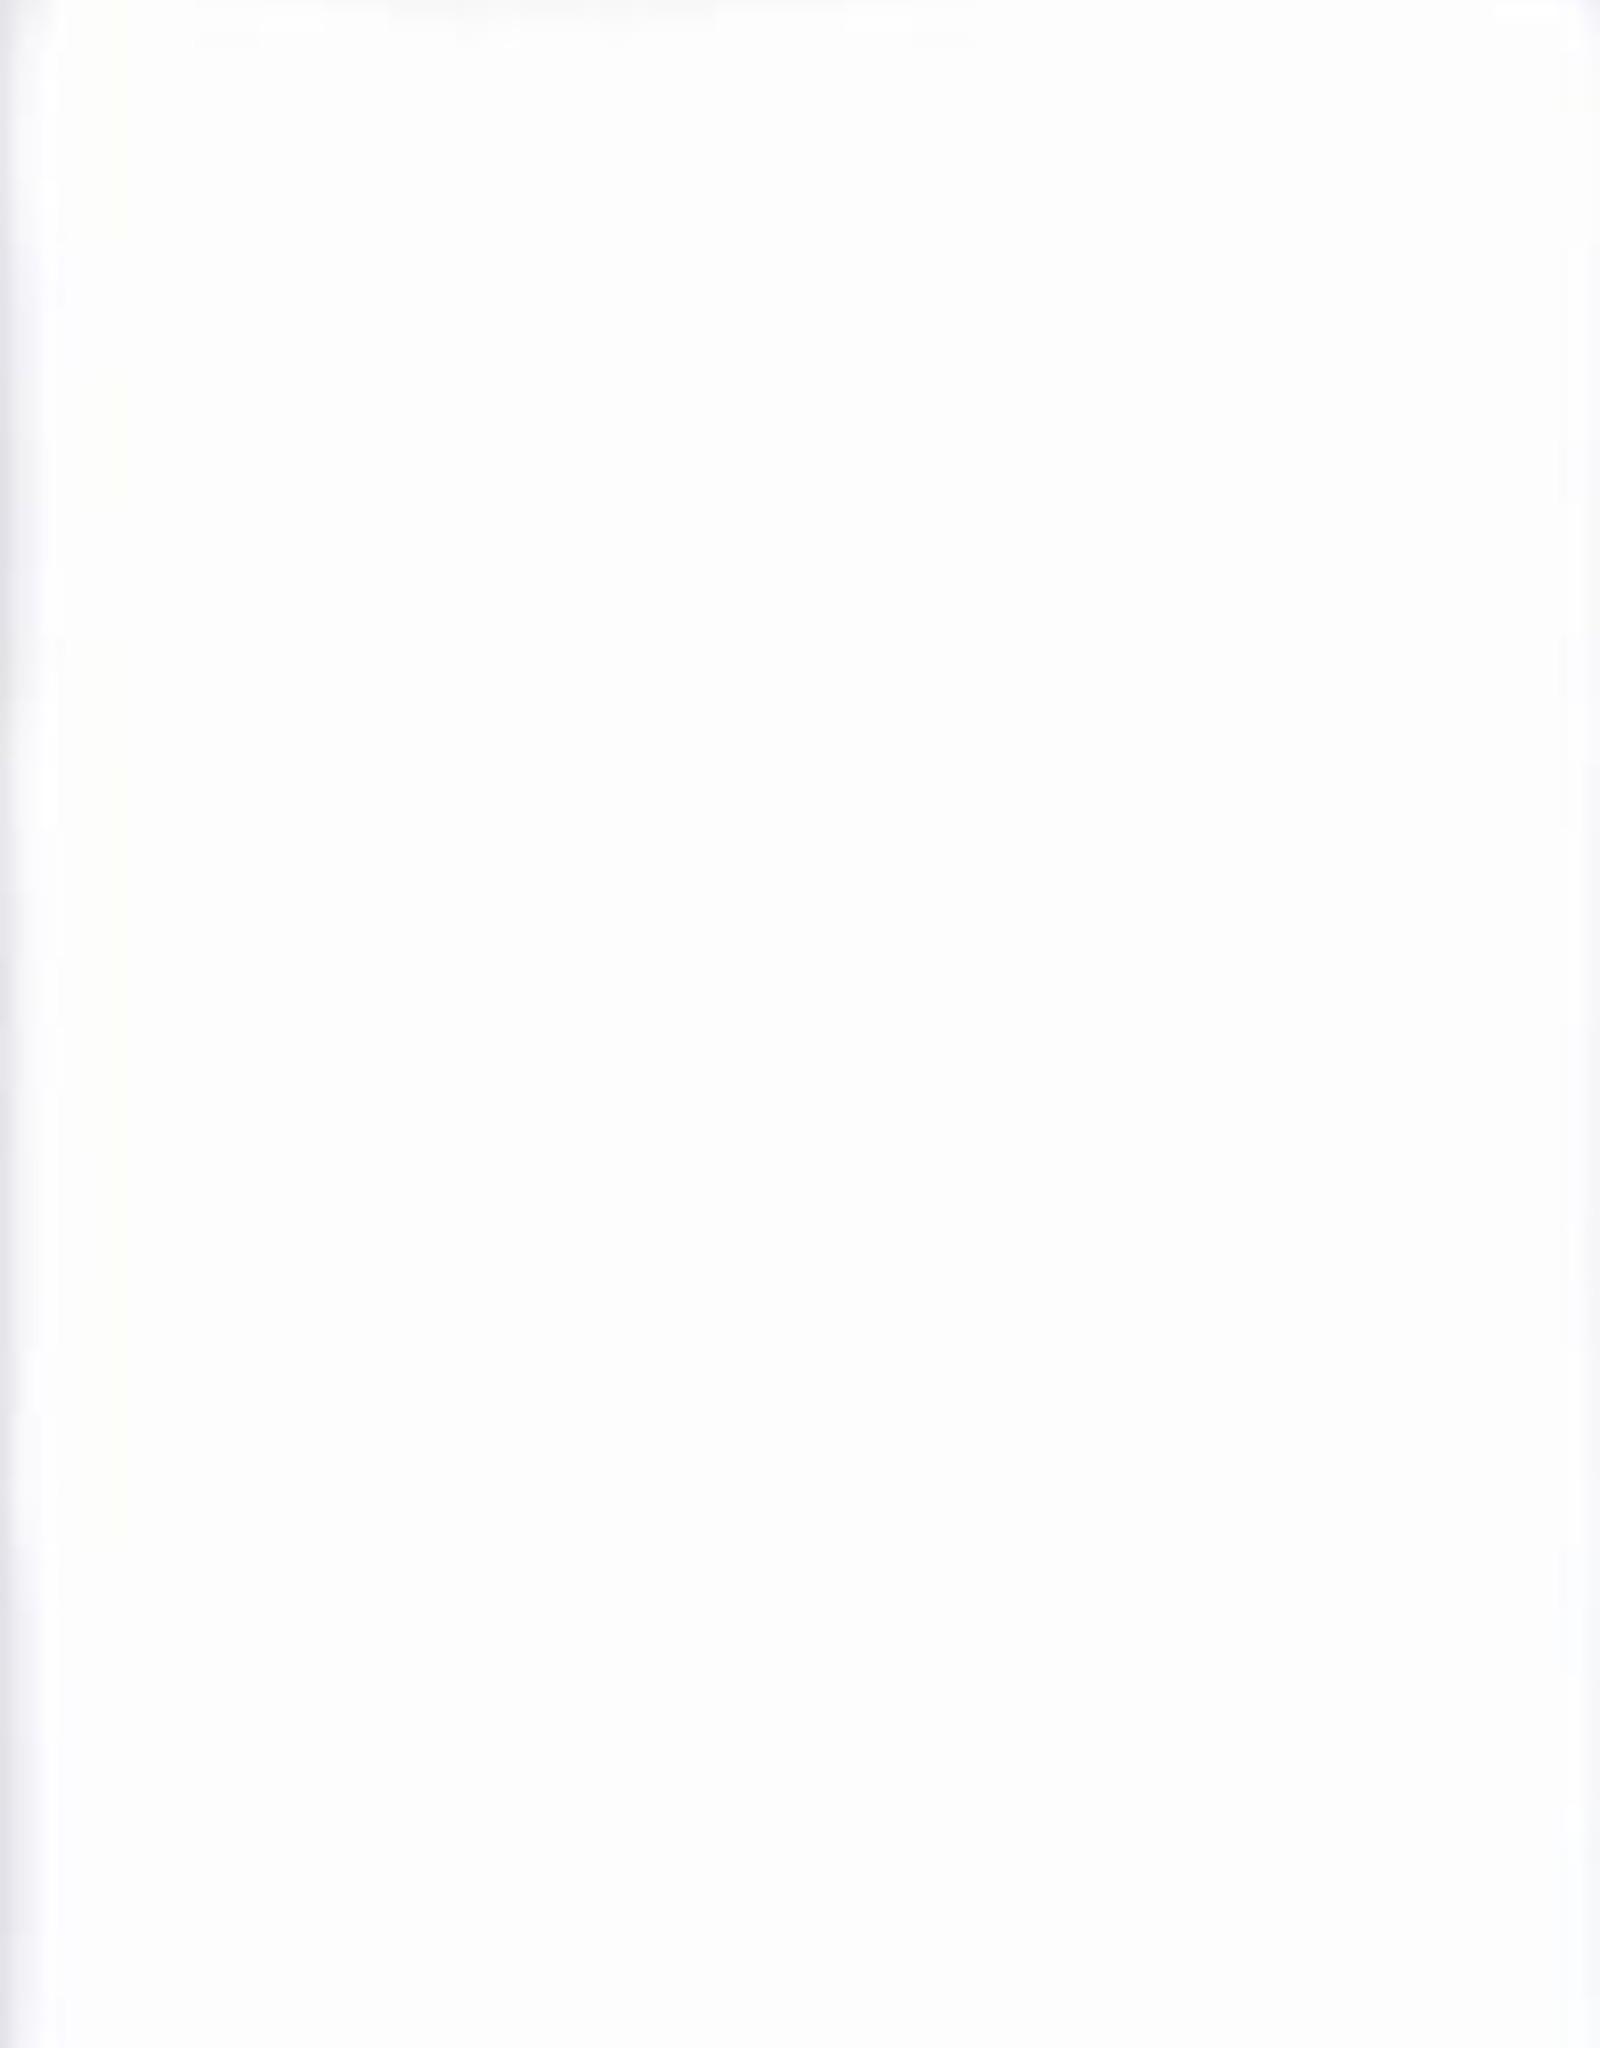 "Yupo, White, 74# Cover, 20"" x 26"", 200gsm"